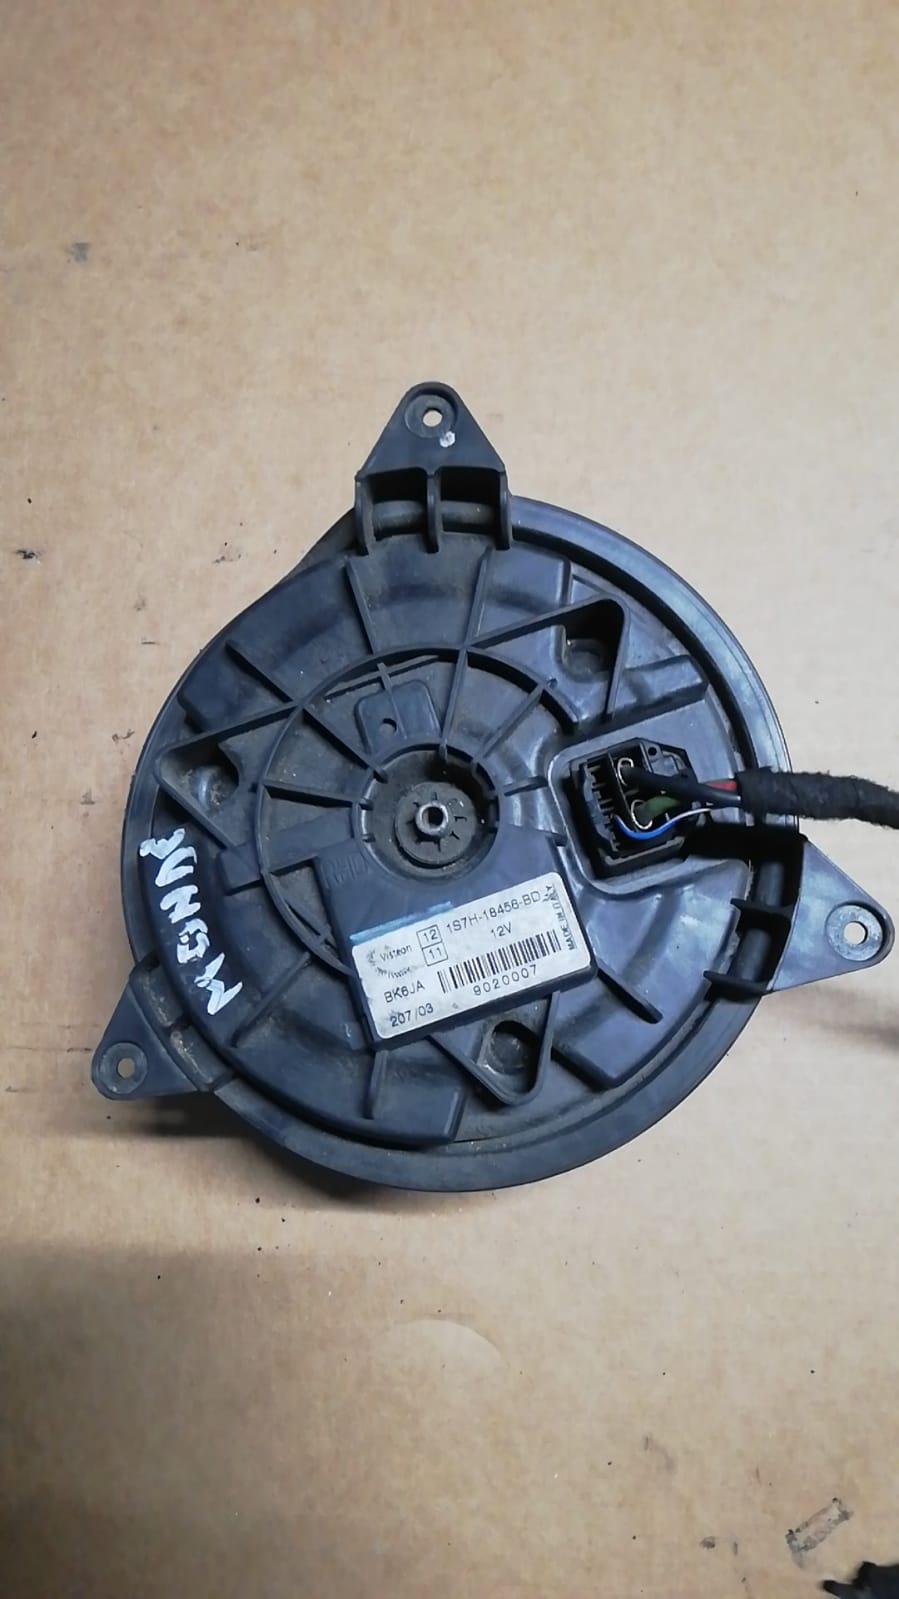 Ventilator habitaclu Ford Mondeo MK3 cod 1S7H18456 BD (M00475)